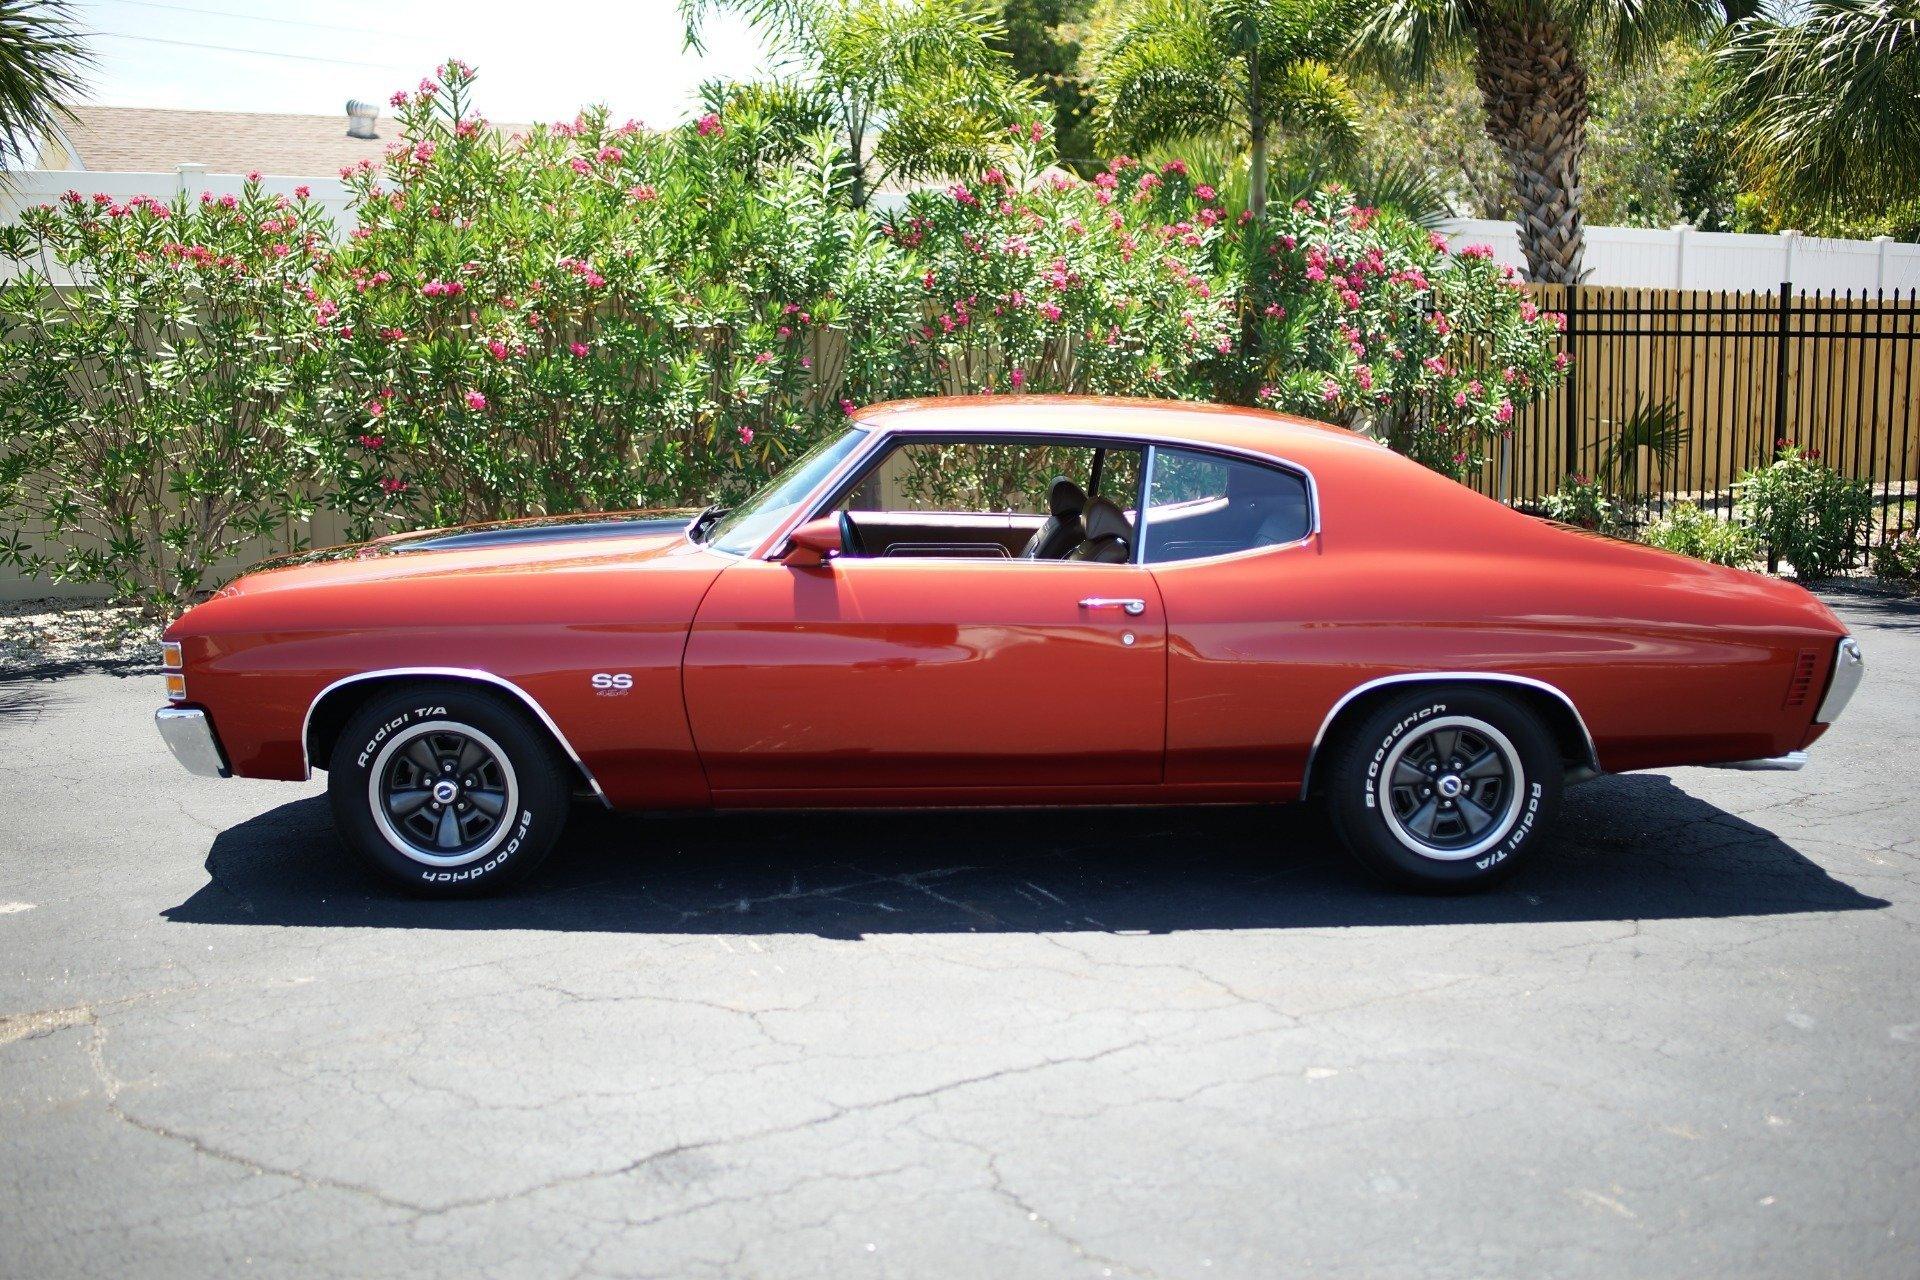 1971 Chevrolet Chevelle Ideal Classic Cars Llc